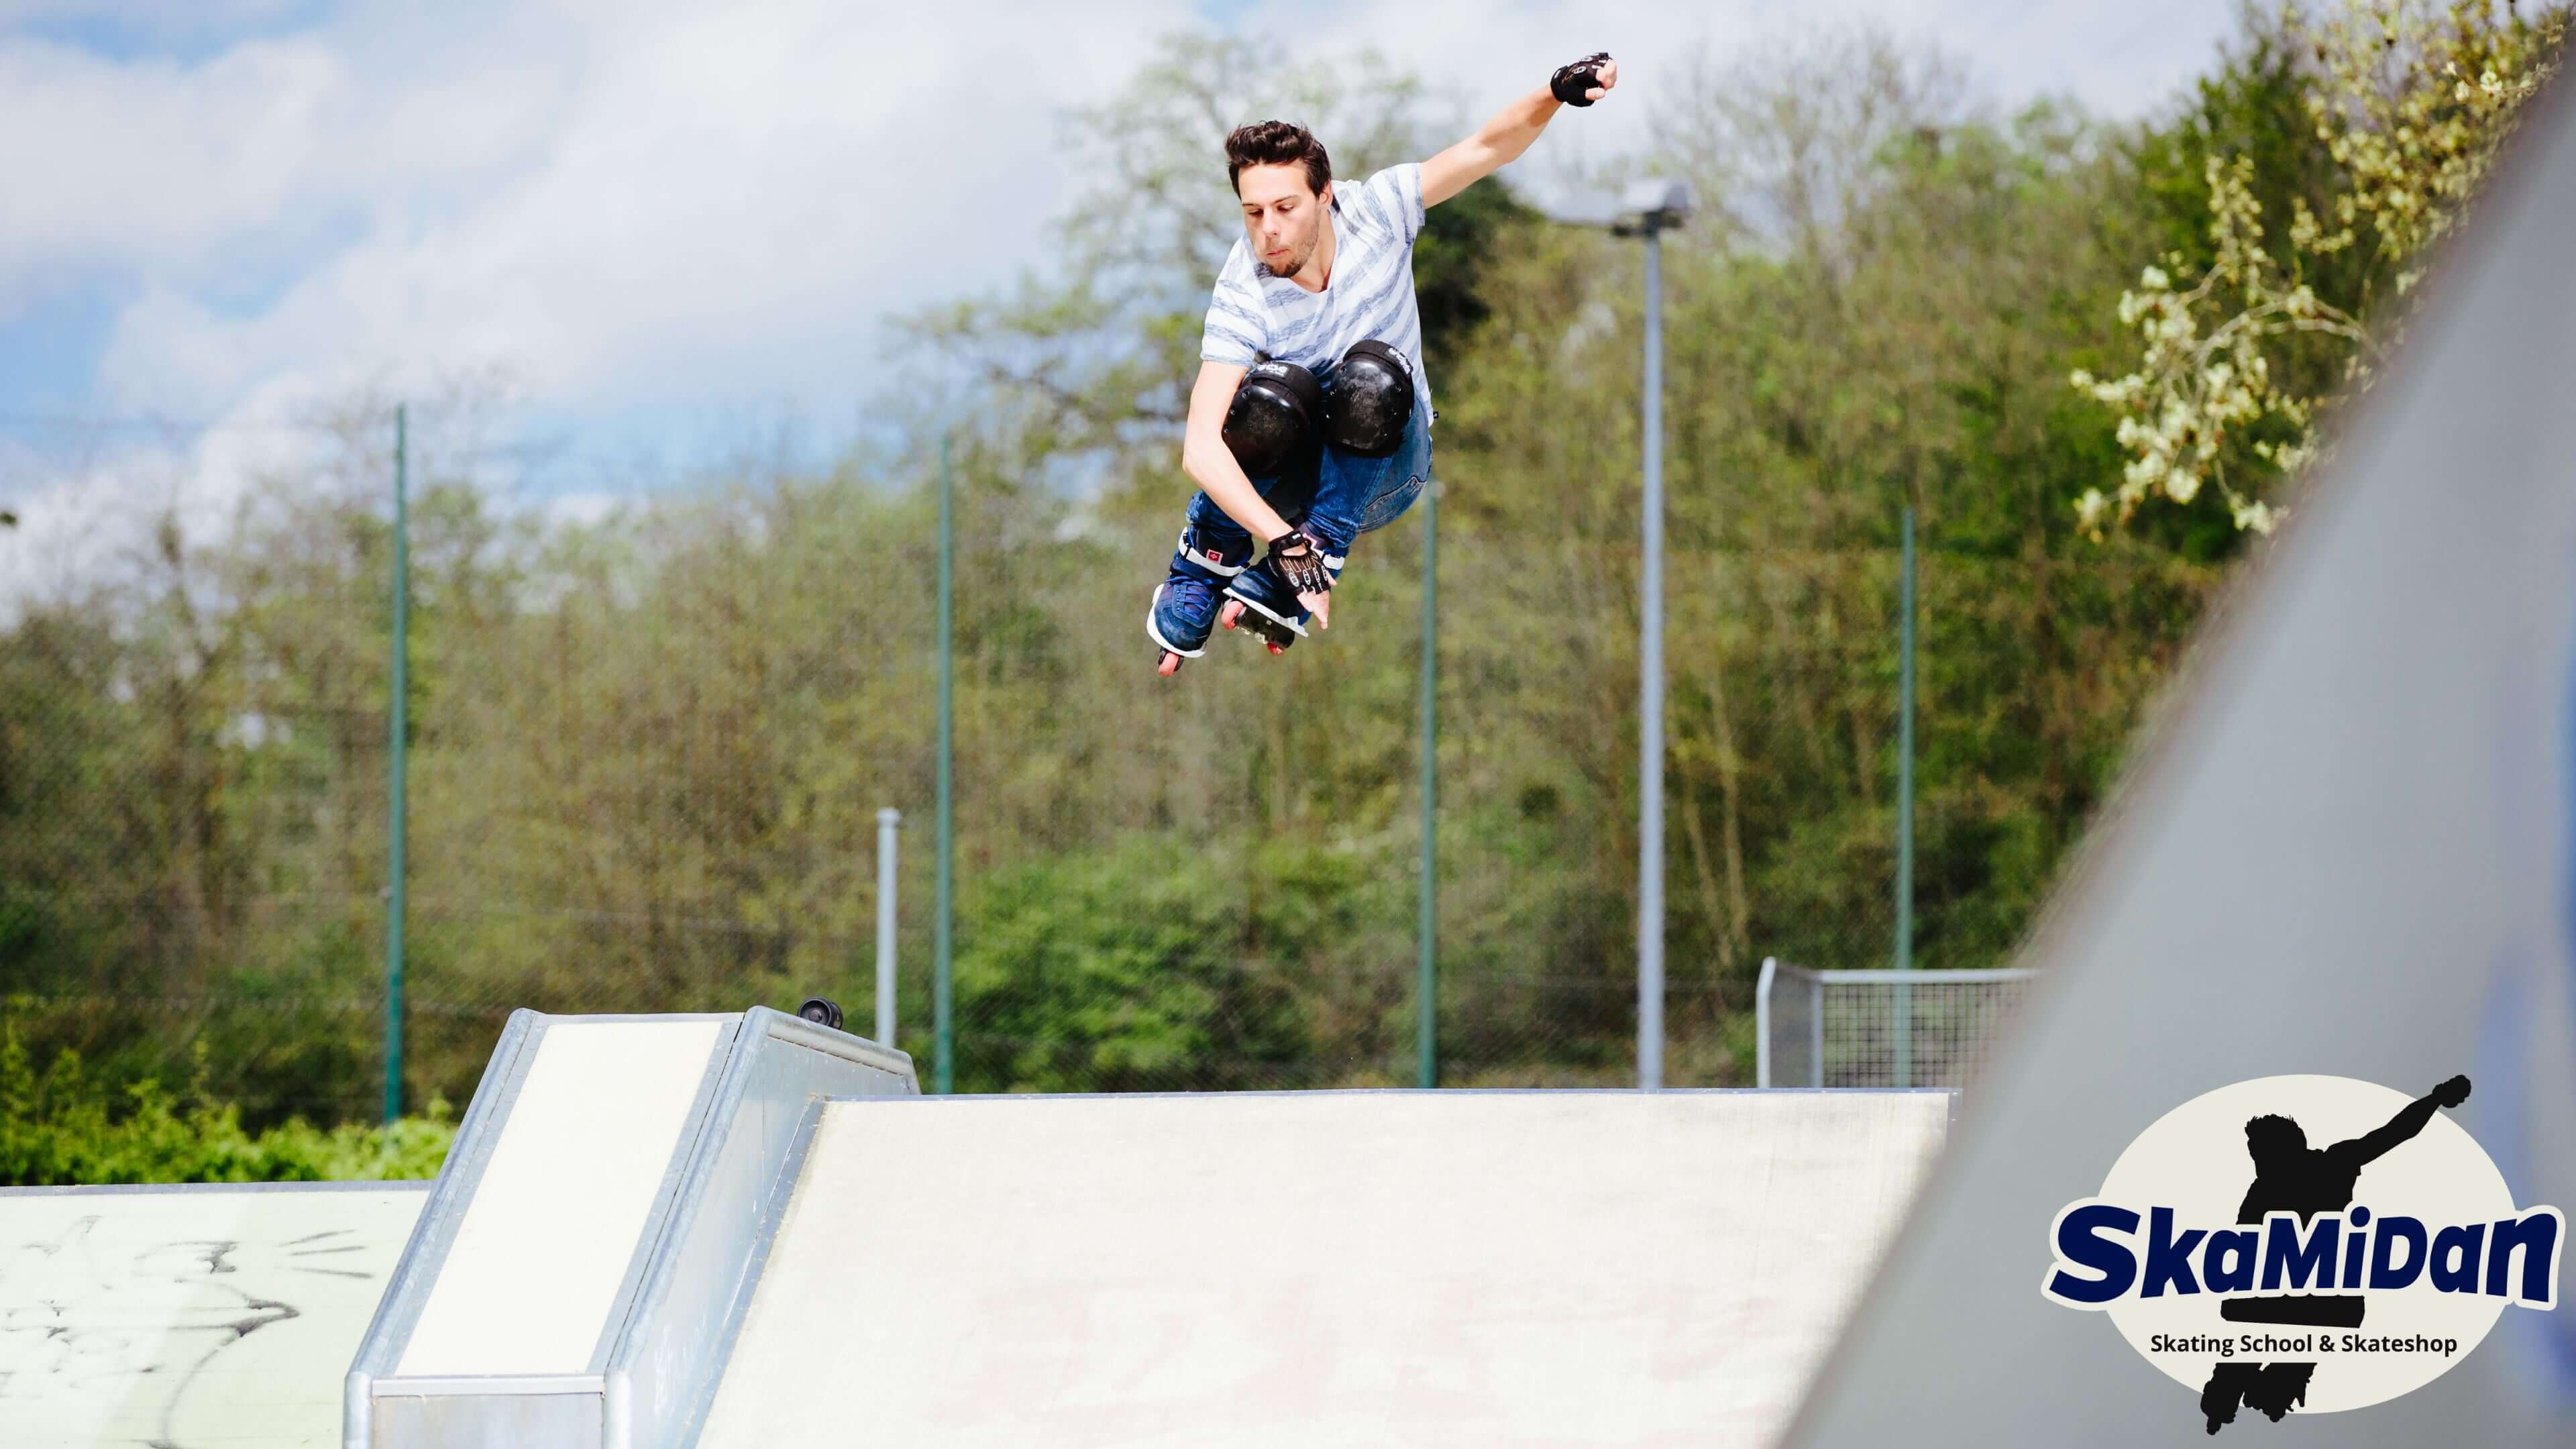 Skateschule SkaMiDan Weil am Rhein Basel Lörrach und Region Aggressive Inline Skating Kurse